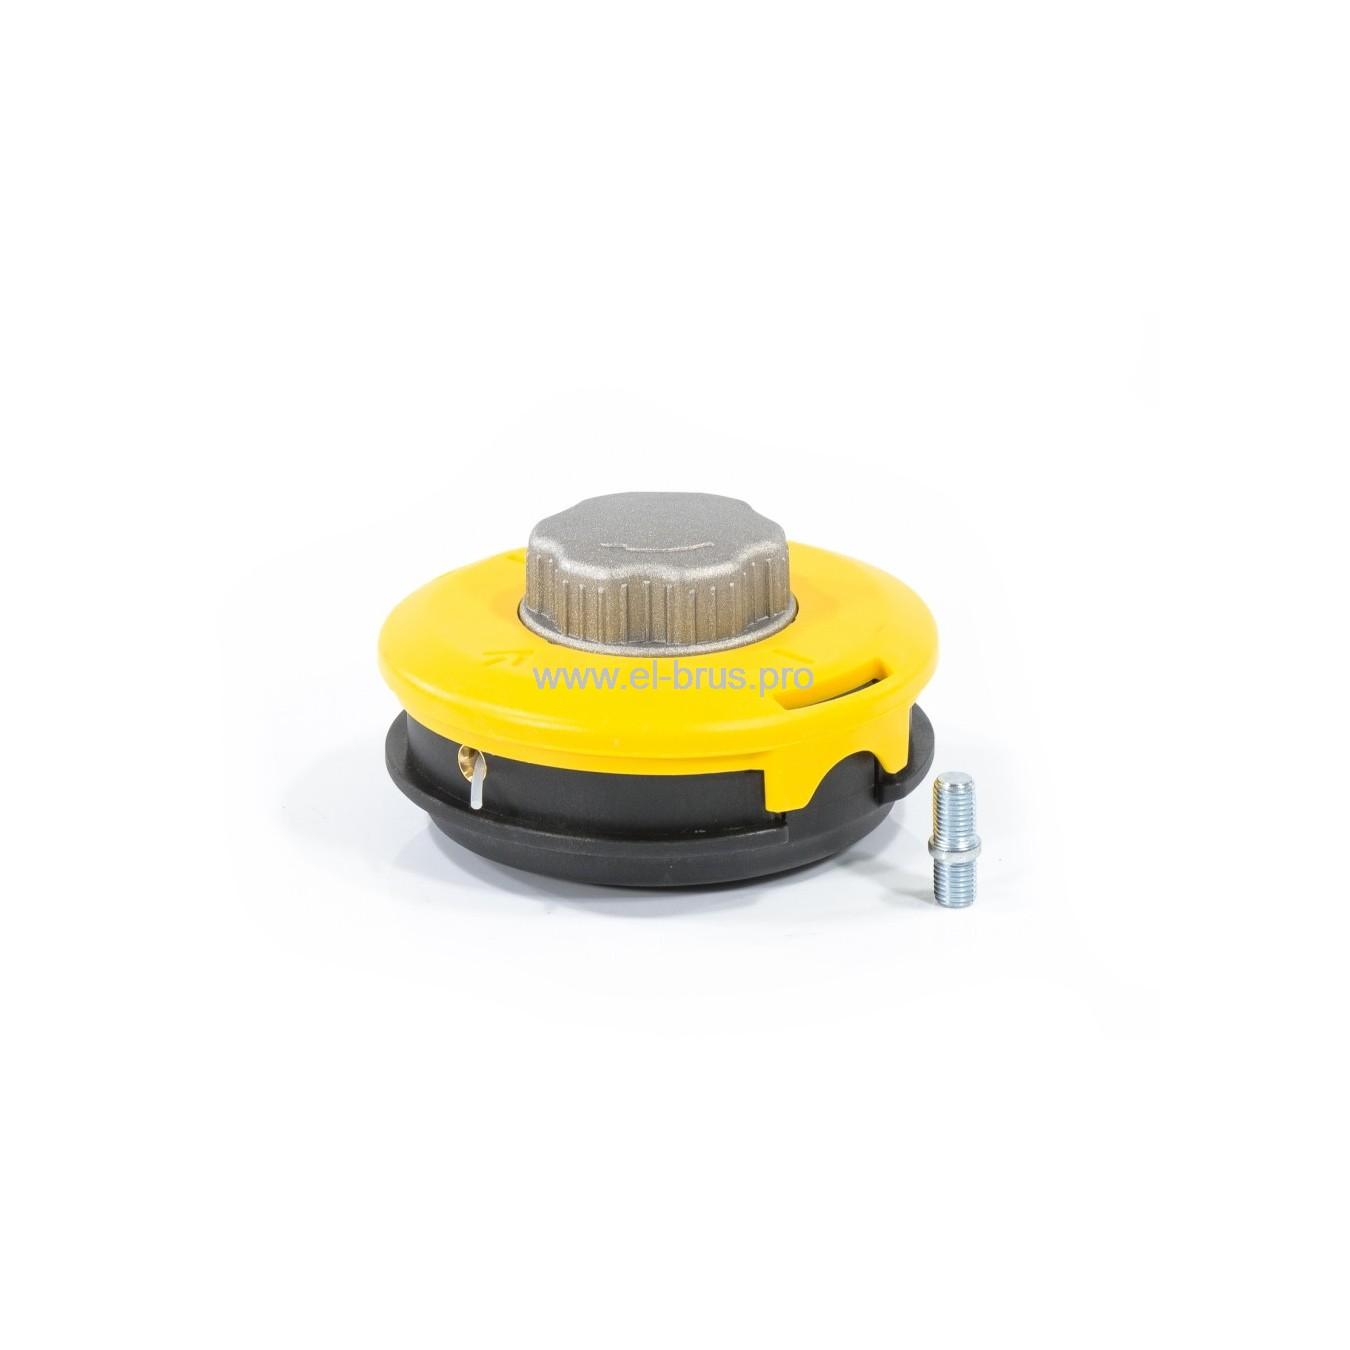 Катушка для триммера полуавтомат М10х1,25 левая DENZEL леска до 3,0мм